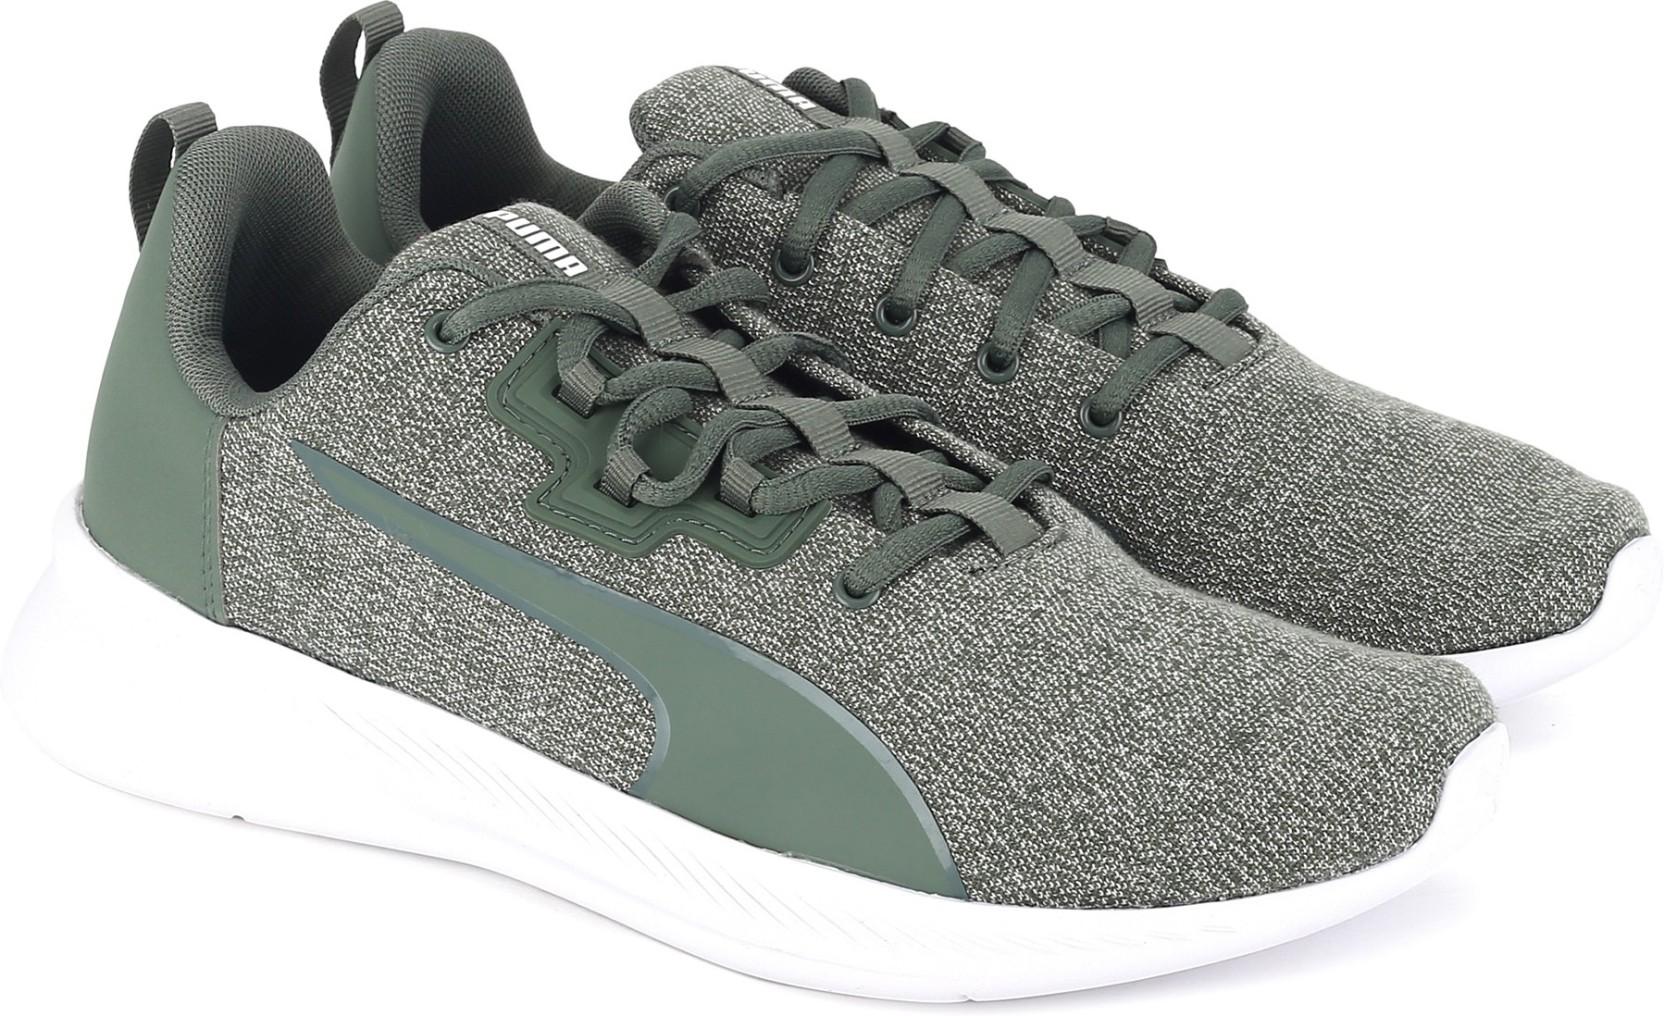 65101ae2f90 Puma Tishatsu Runner Knit Wn s Sneakers For Women - Buy Laurel ...